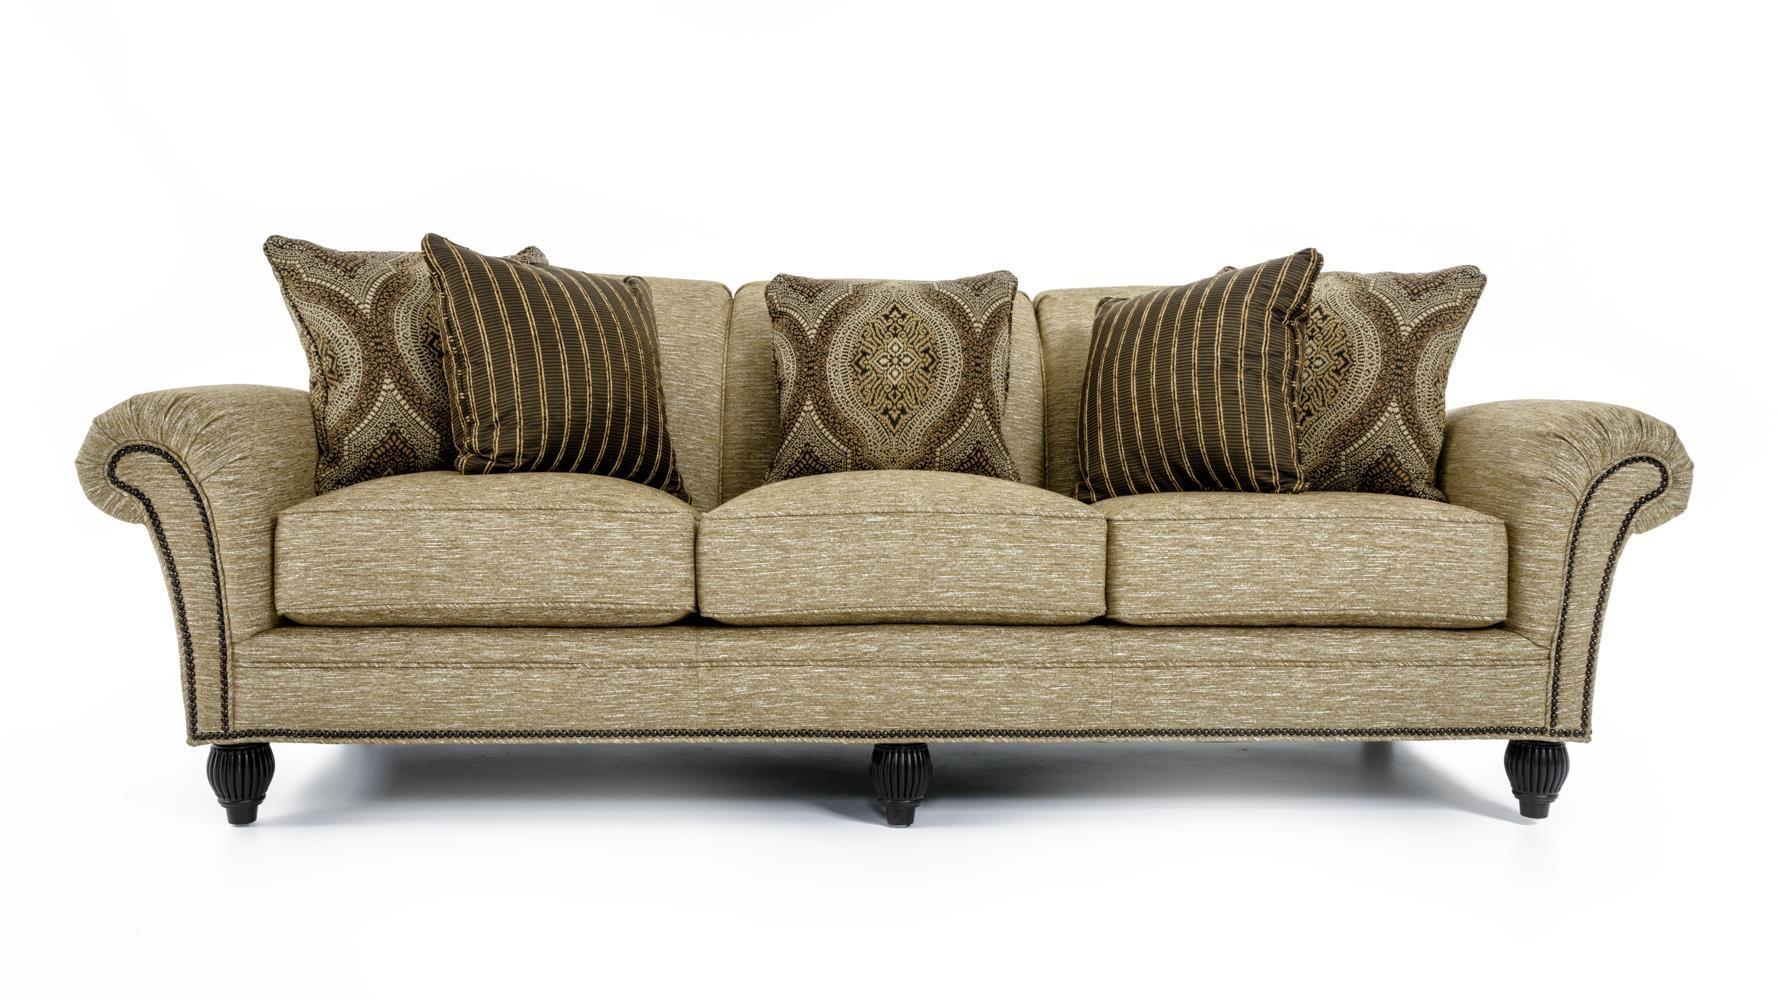 Royal Kahala Edgewater Sofa by Tommy Bahama Home at Baer's Furniture